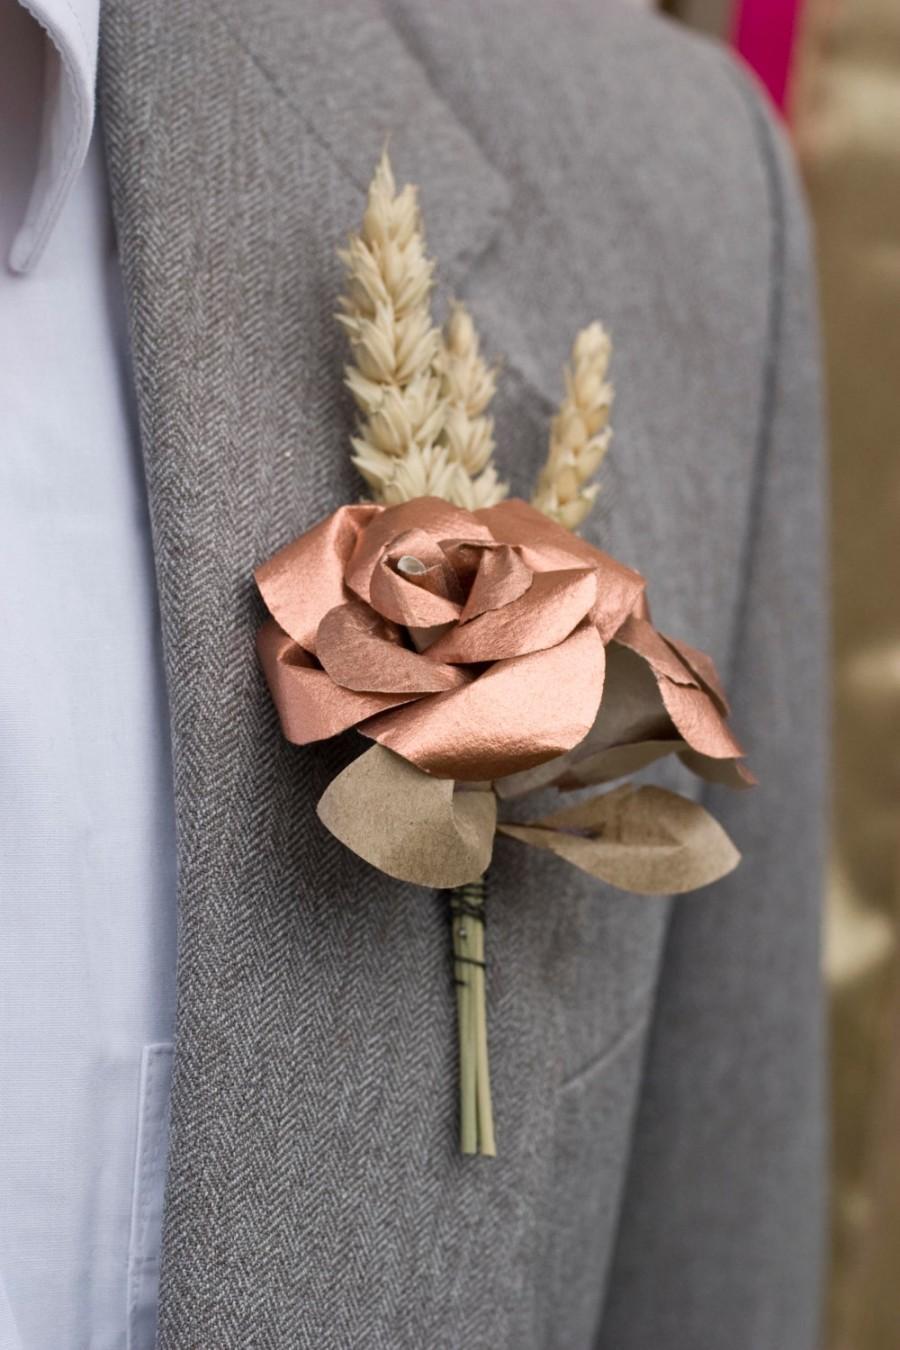 Mariage - Copper and Wheat Buttonhole / Paper Boutonniere / Mens Buttonholes / Metallic Rose Gold Paper Flower Buttonholes / Rustic Wedding / UK